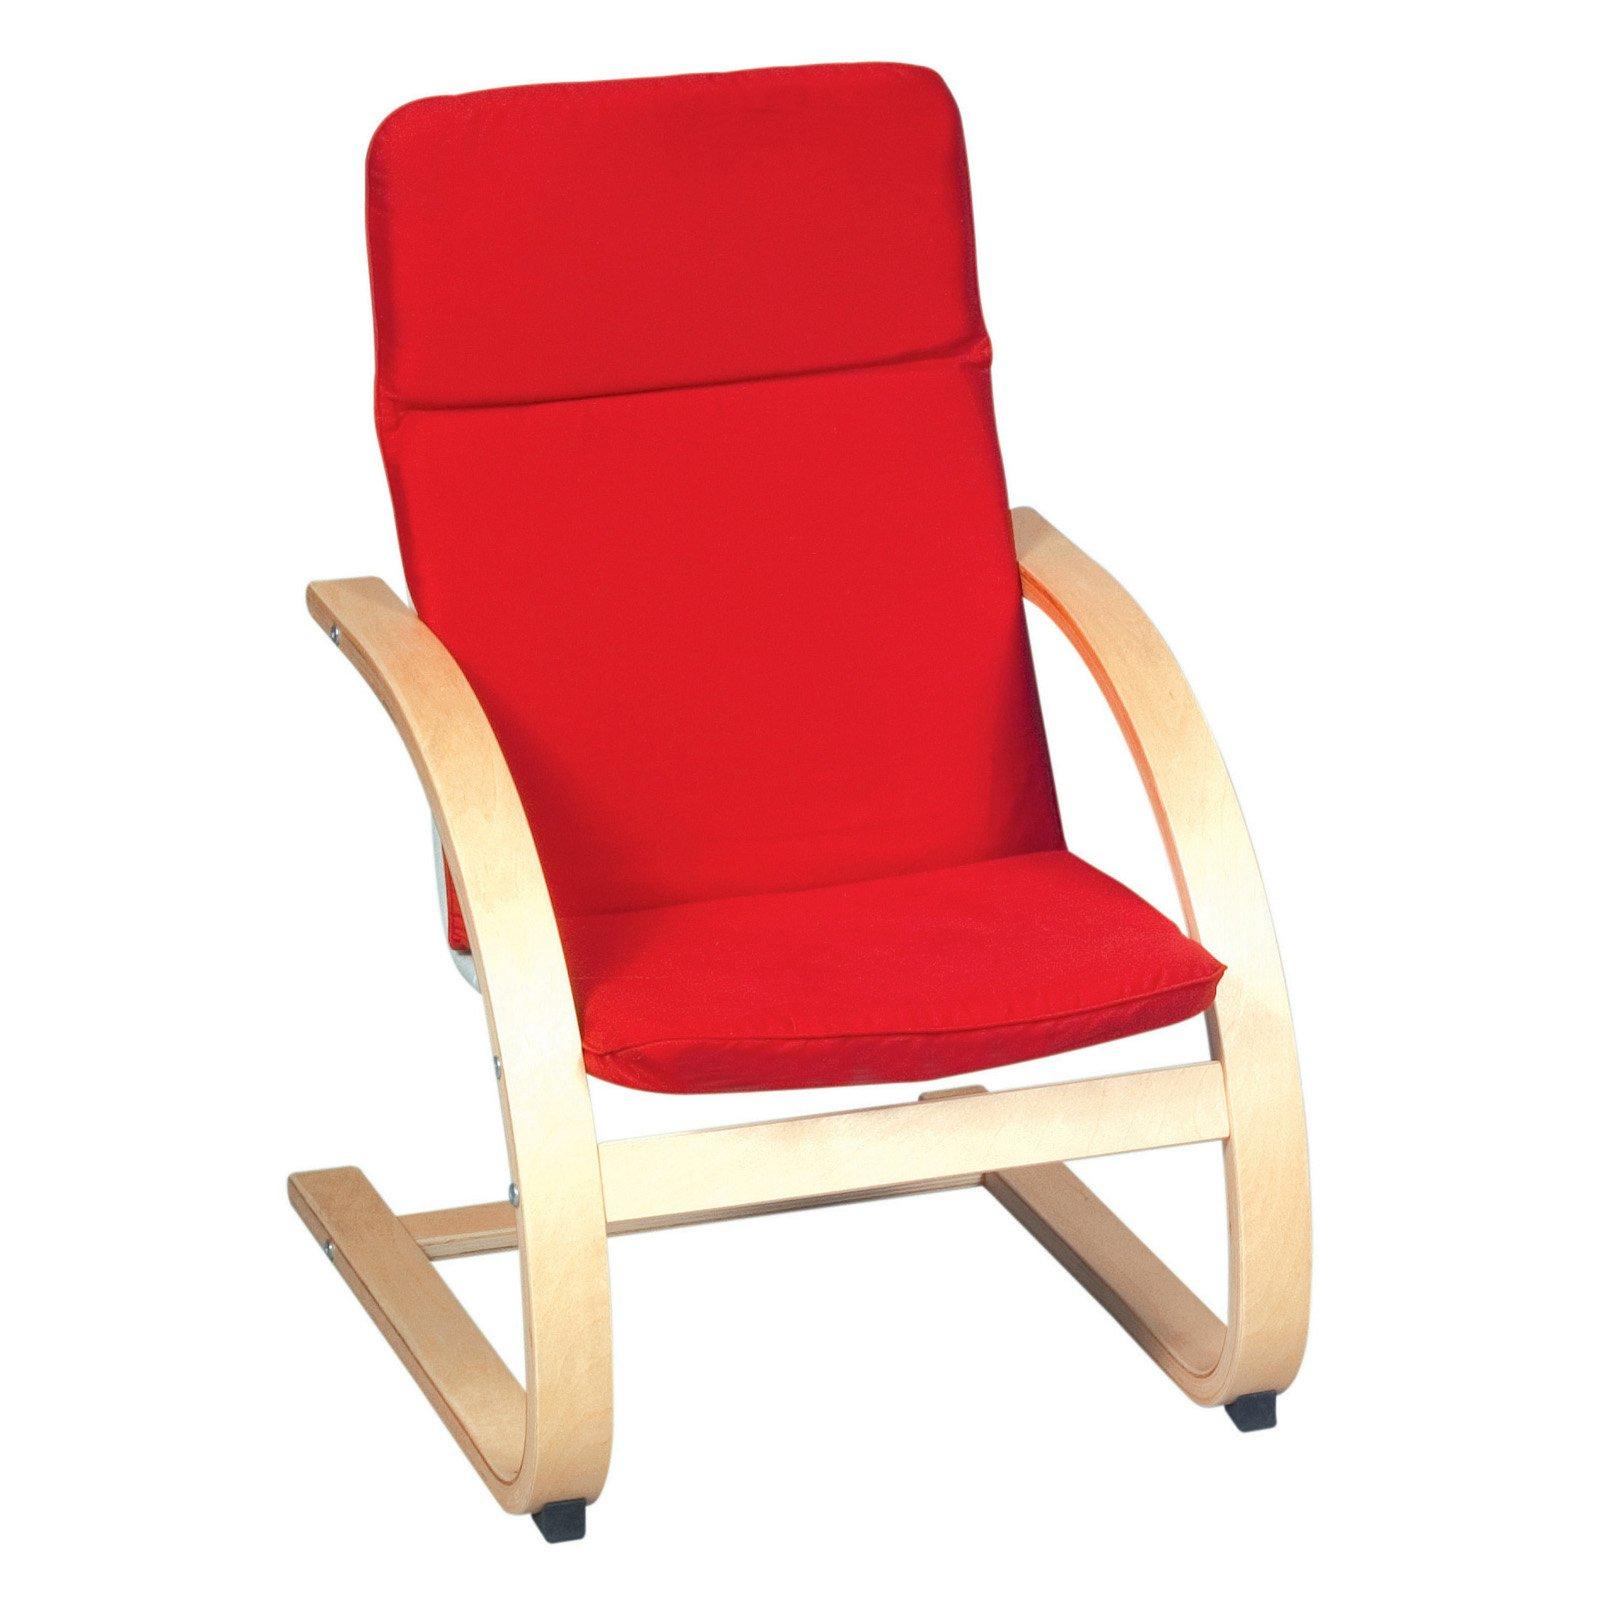 Guidecraft Nordic Kid's Rocking Chair